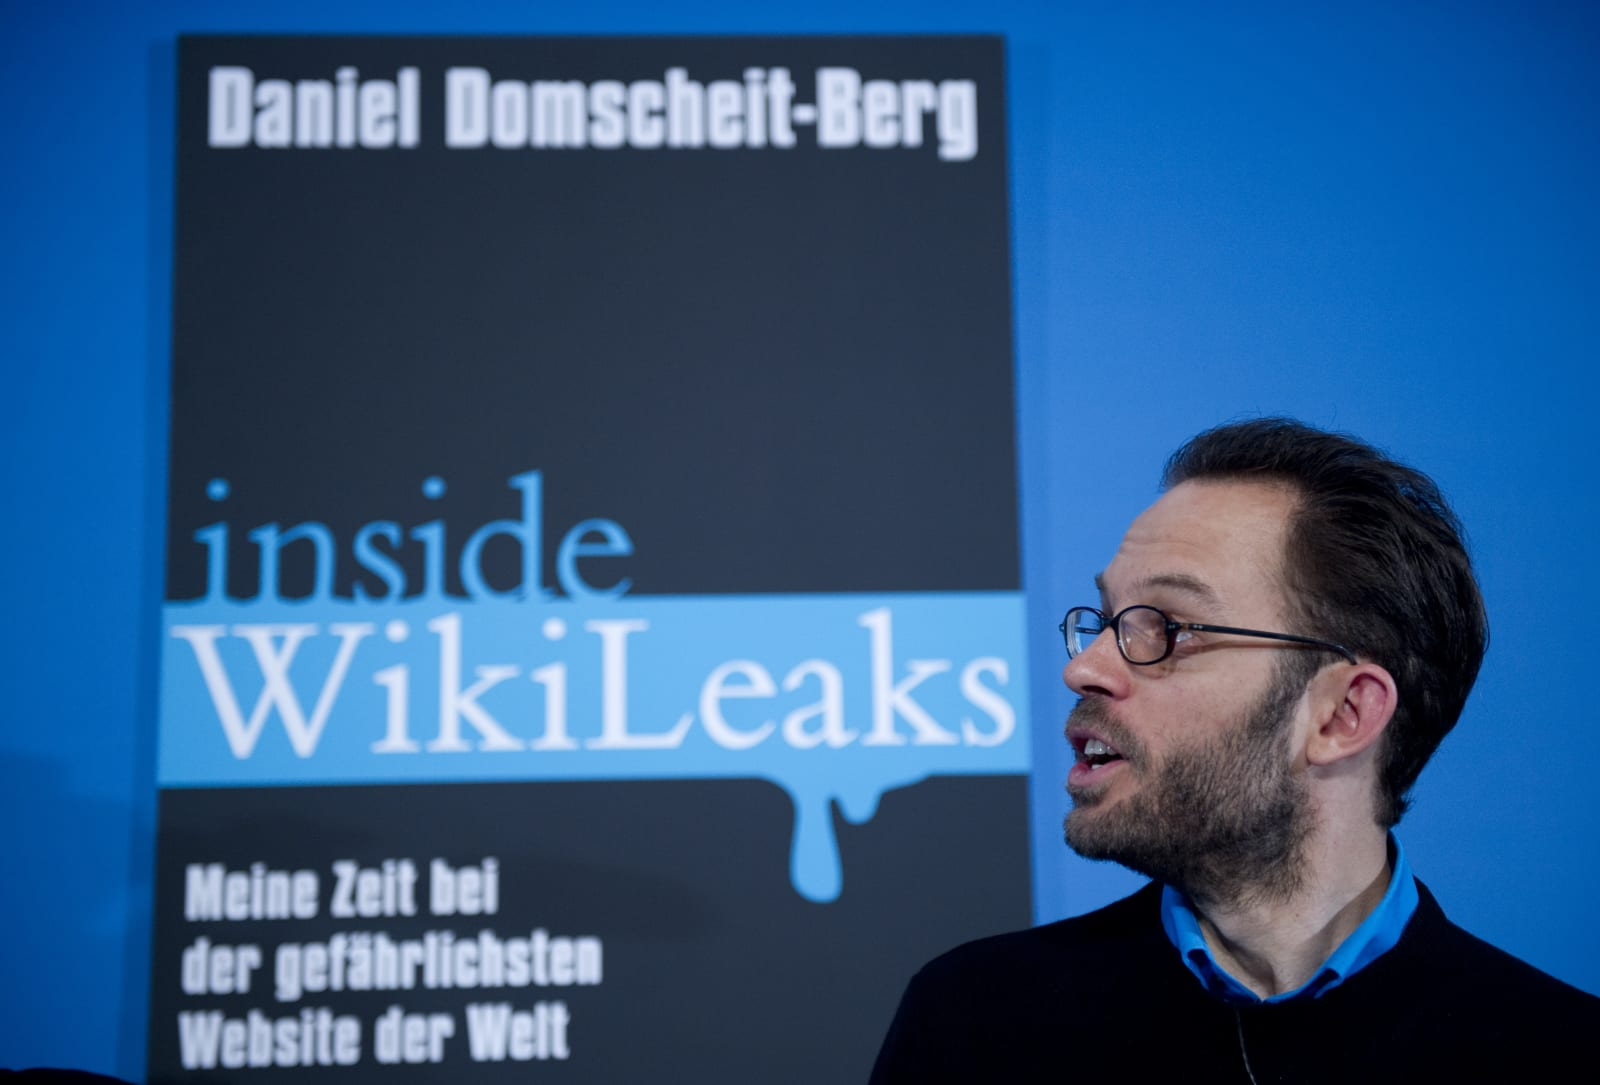 German author and IT specialist Daniel D